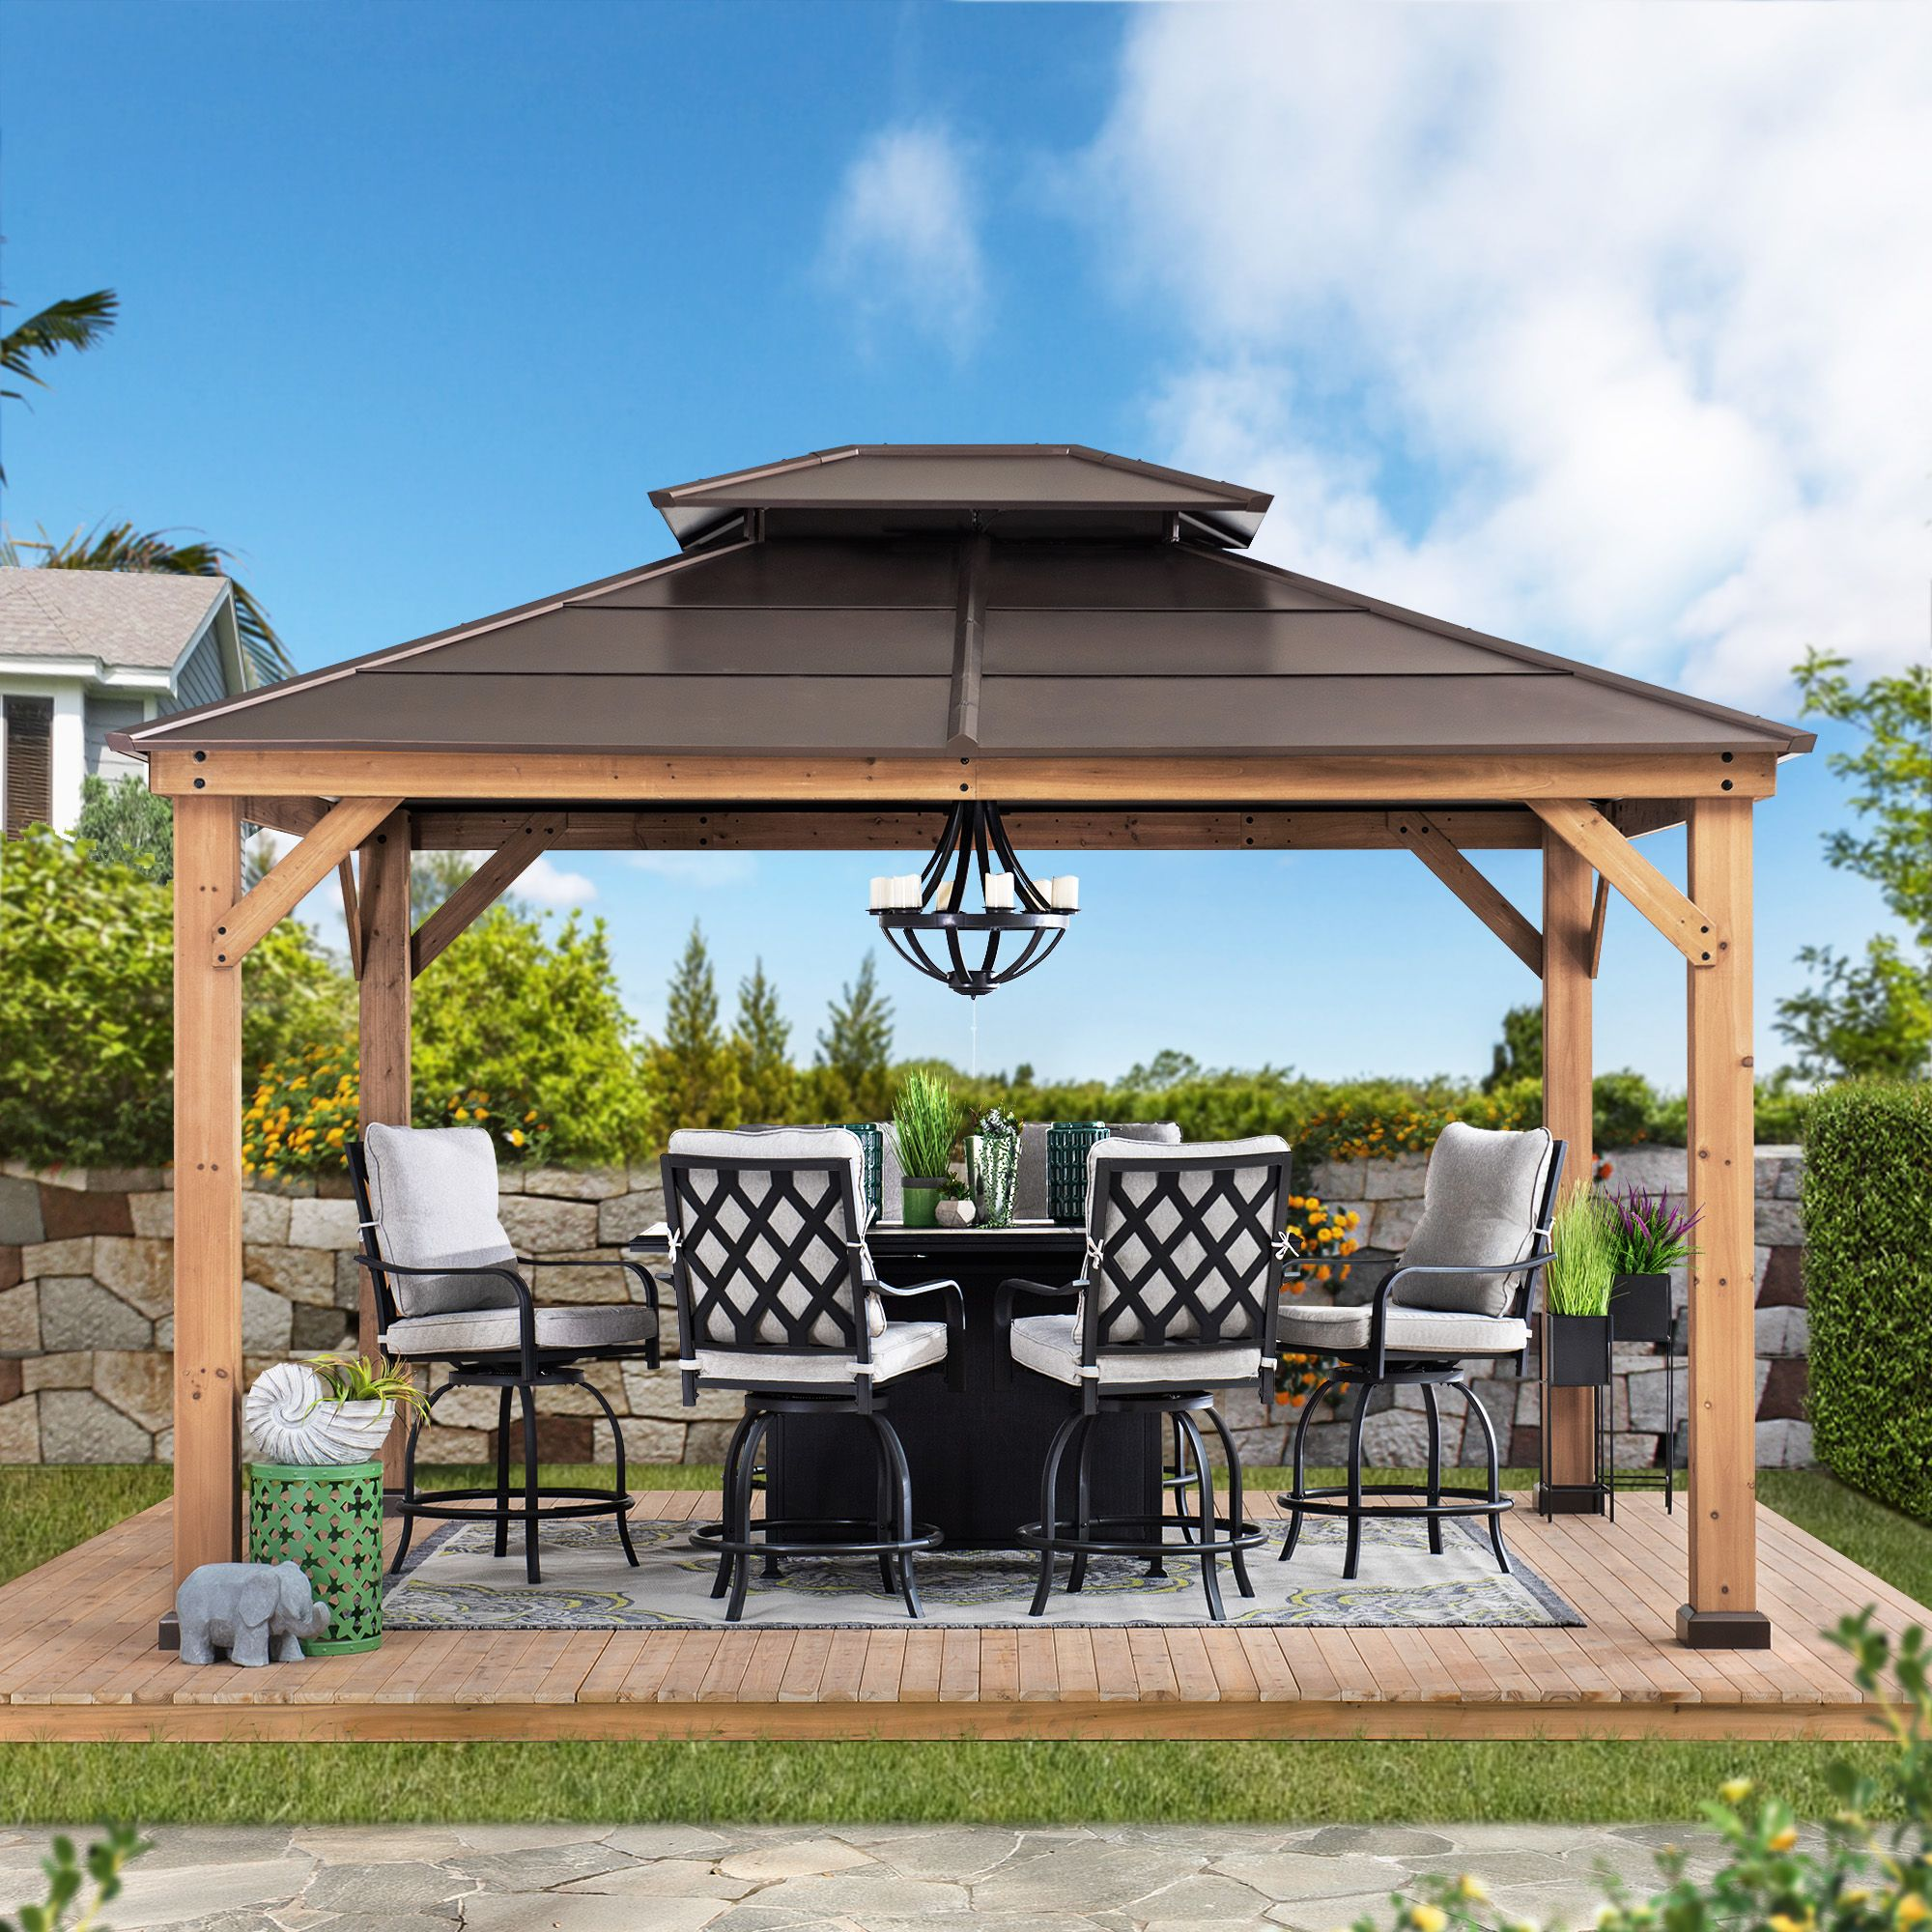 Sunjoy Missouri Collection 10 Ft X 12 Ft Cedar Framed Gazebo With Brown Steel 2 Tier Hip Roof Hardtop Walmart Com In 2020 Backyard Gazebo Gazebo Gazebo Roof